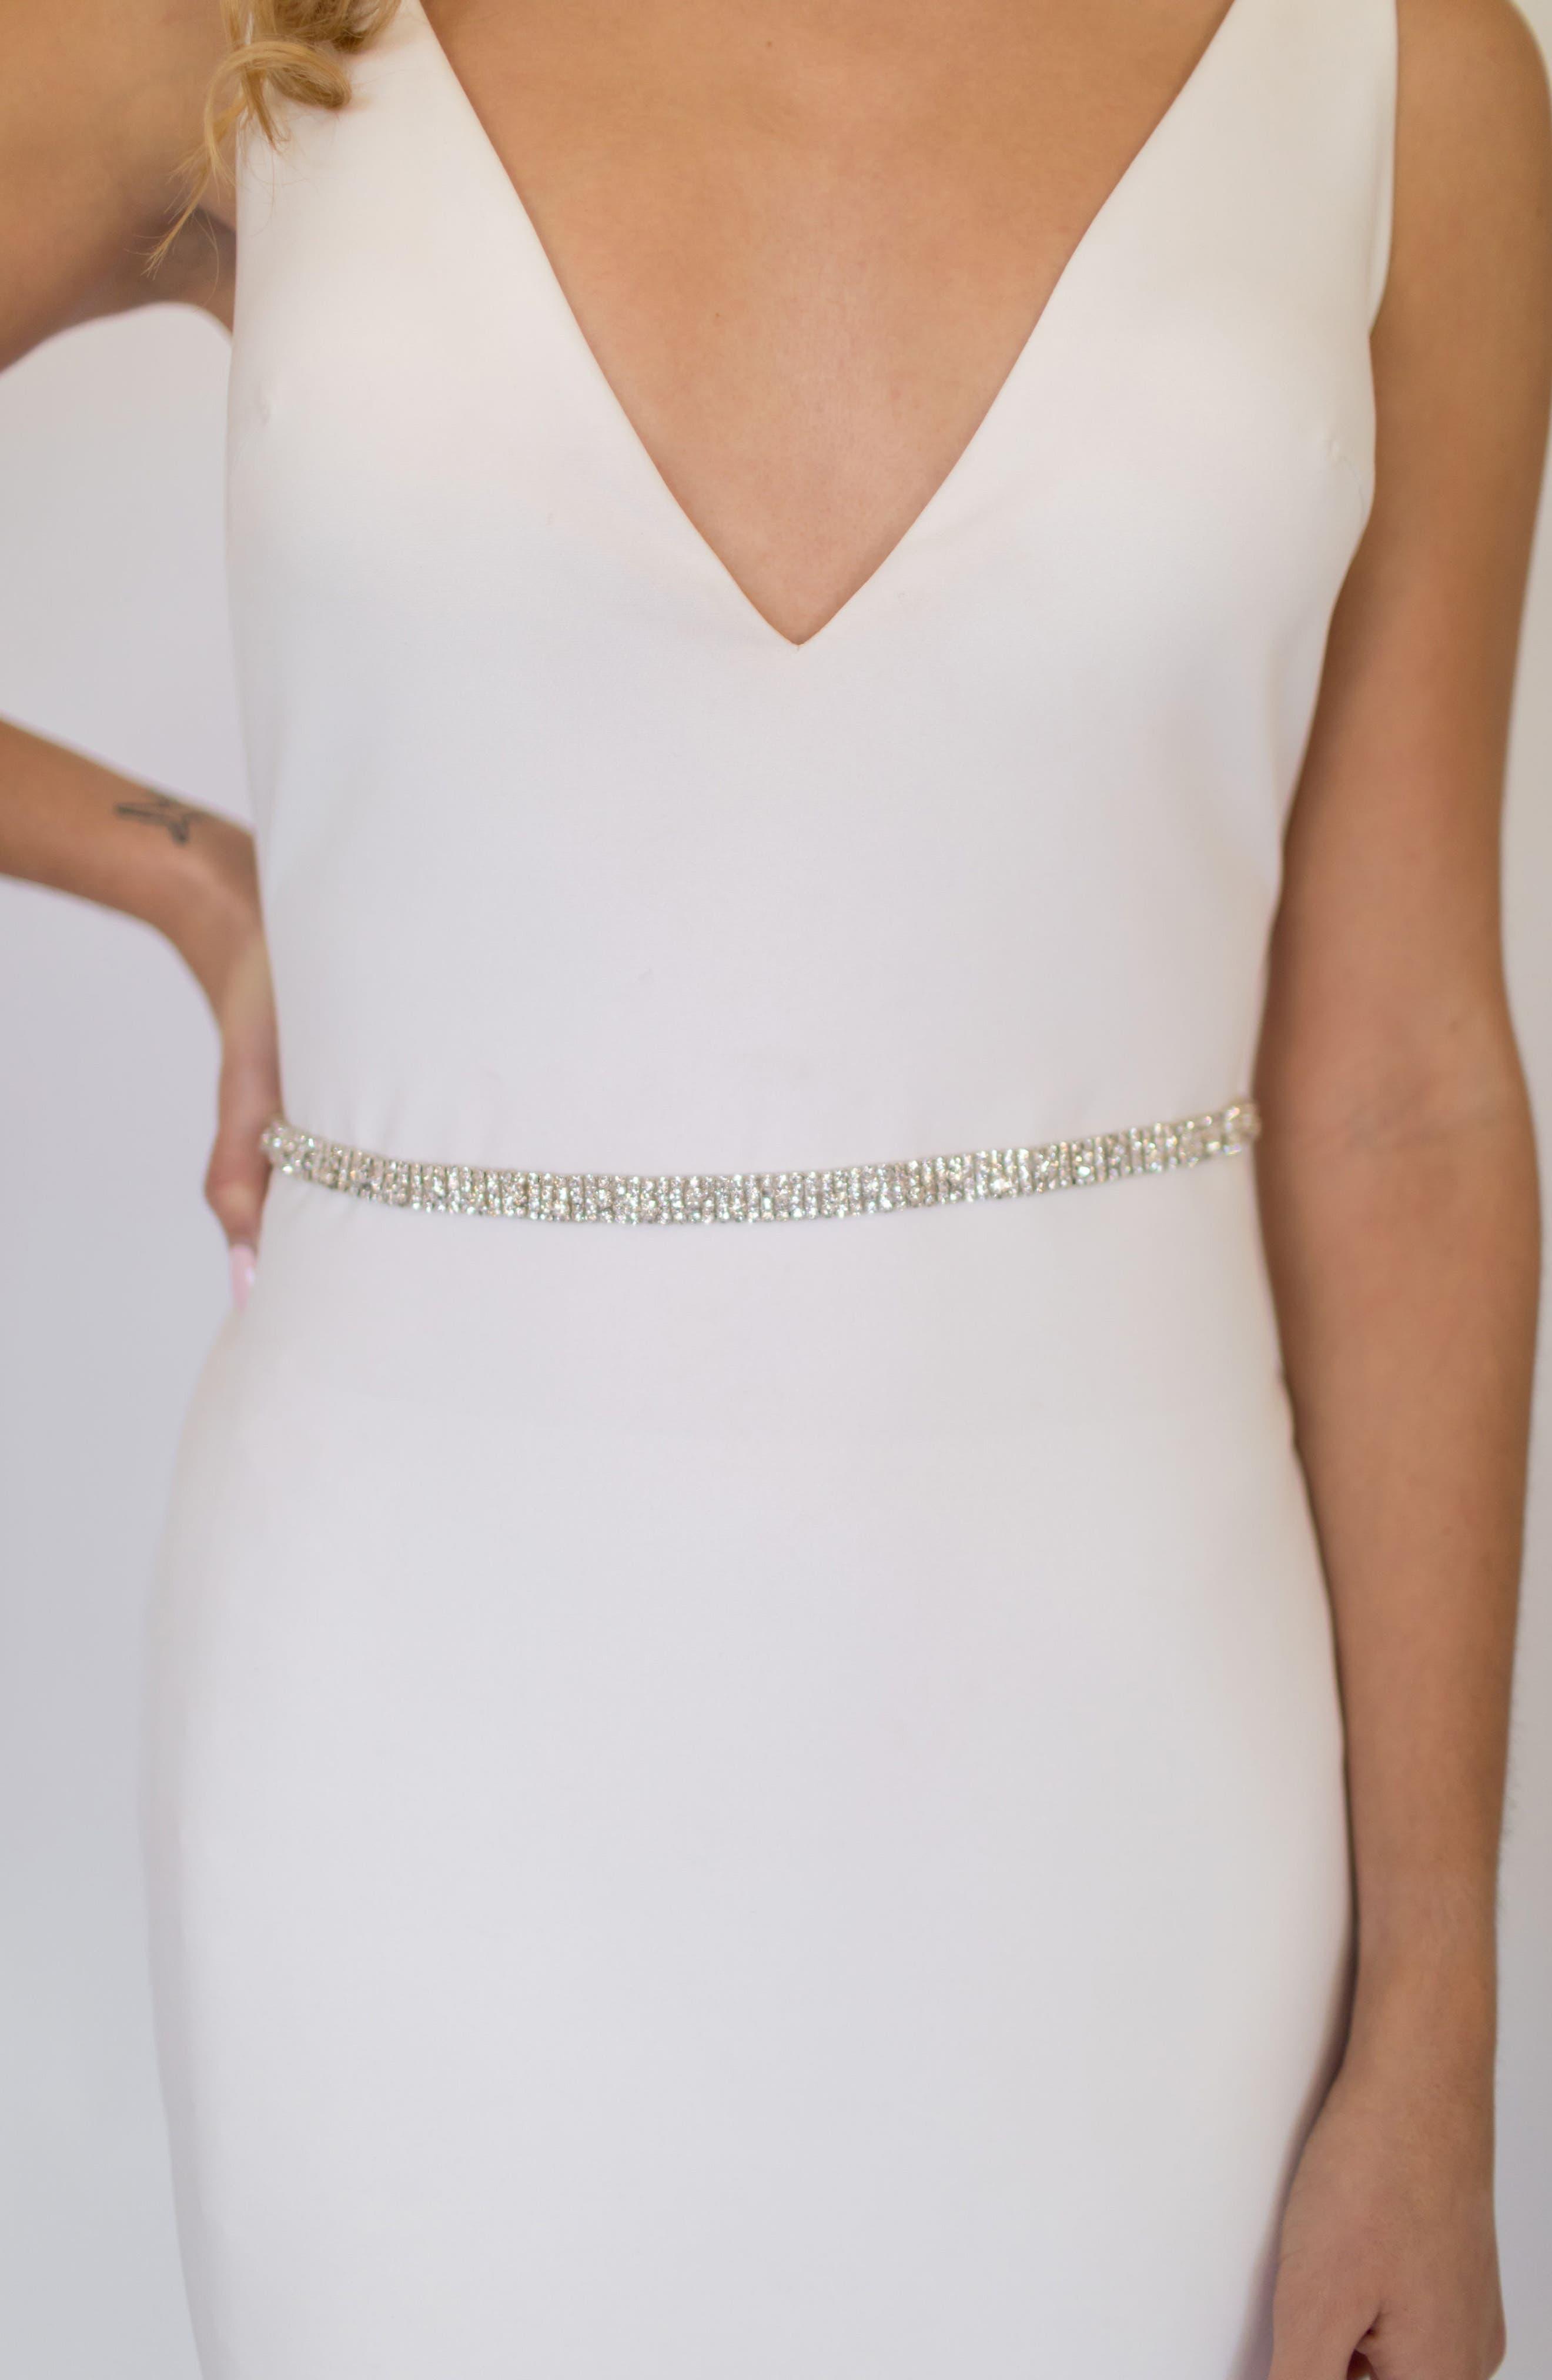 Untamed Petals By Amanda Judge June Crystal Belt, Size One Size - Silver